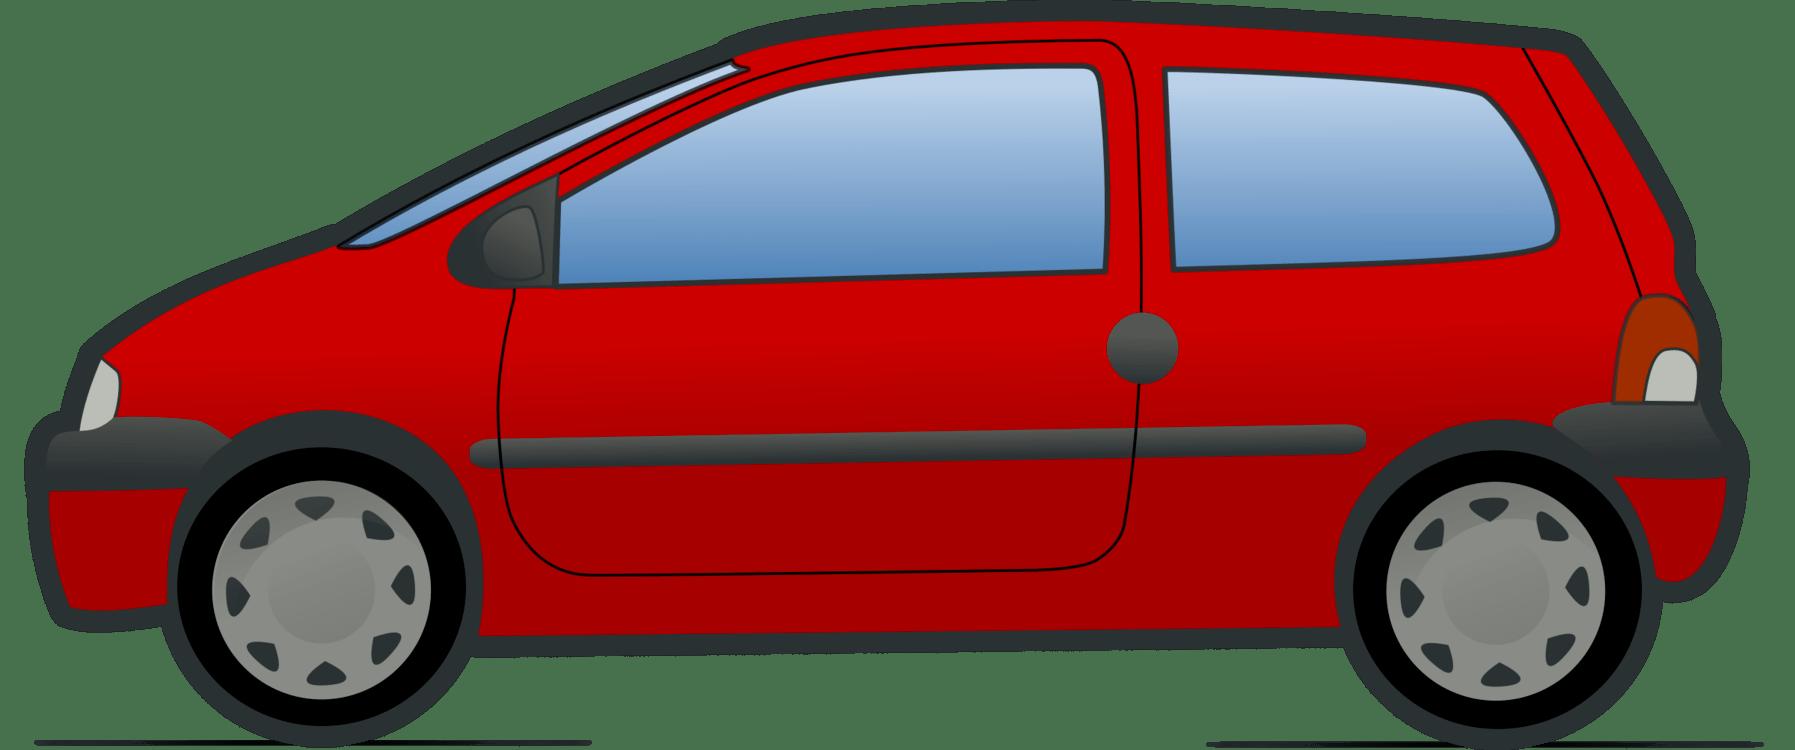 Free minivan clipart 6 » Clipart Portal.